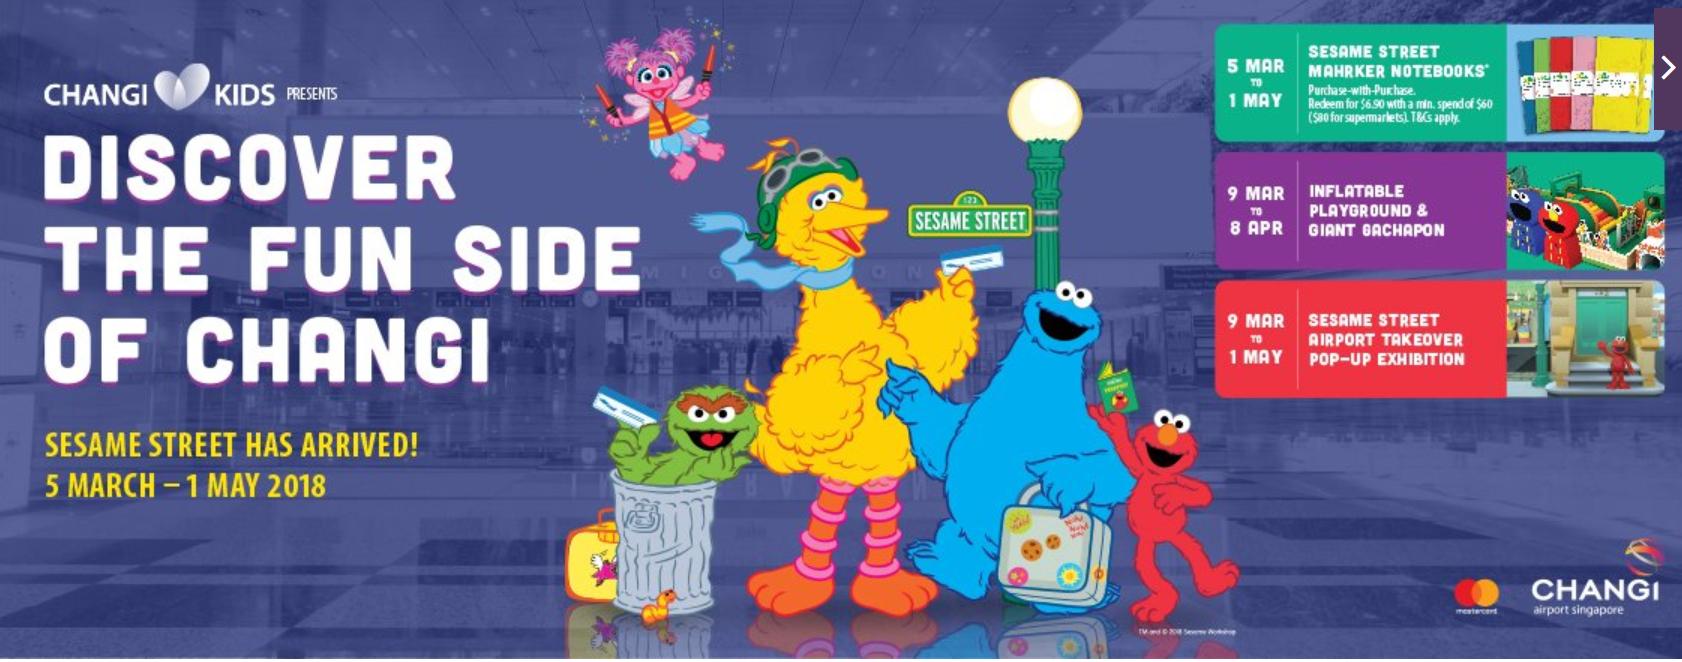 Sesame Street Takes Over Changi Airport With A Giant Elmo